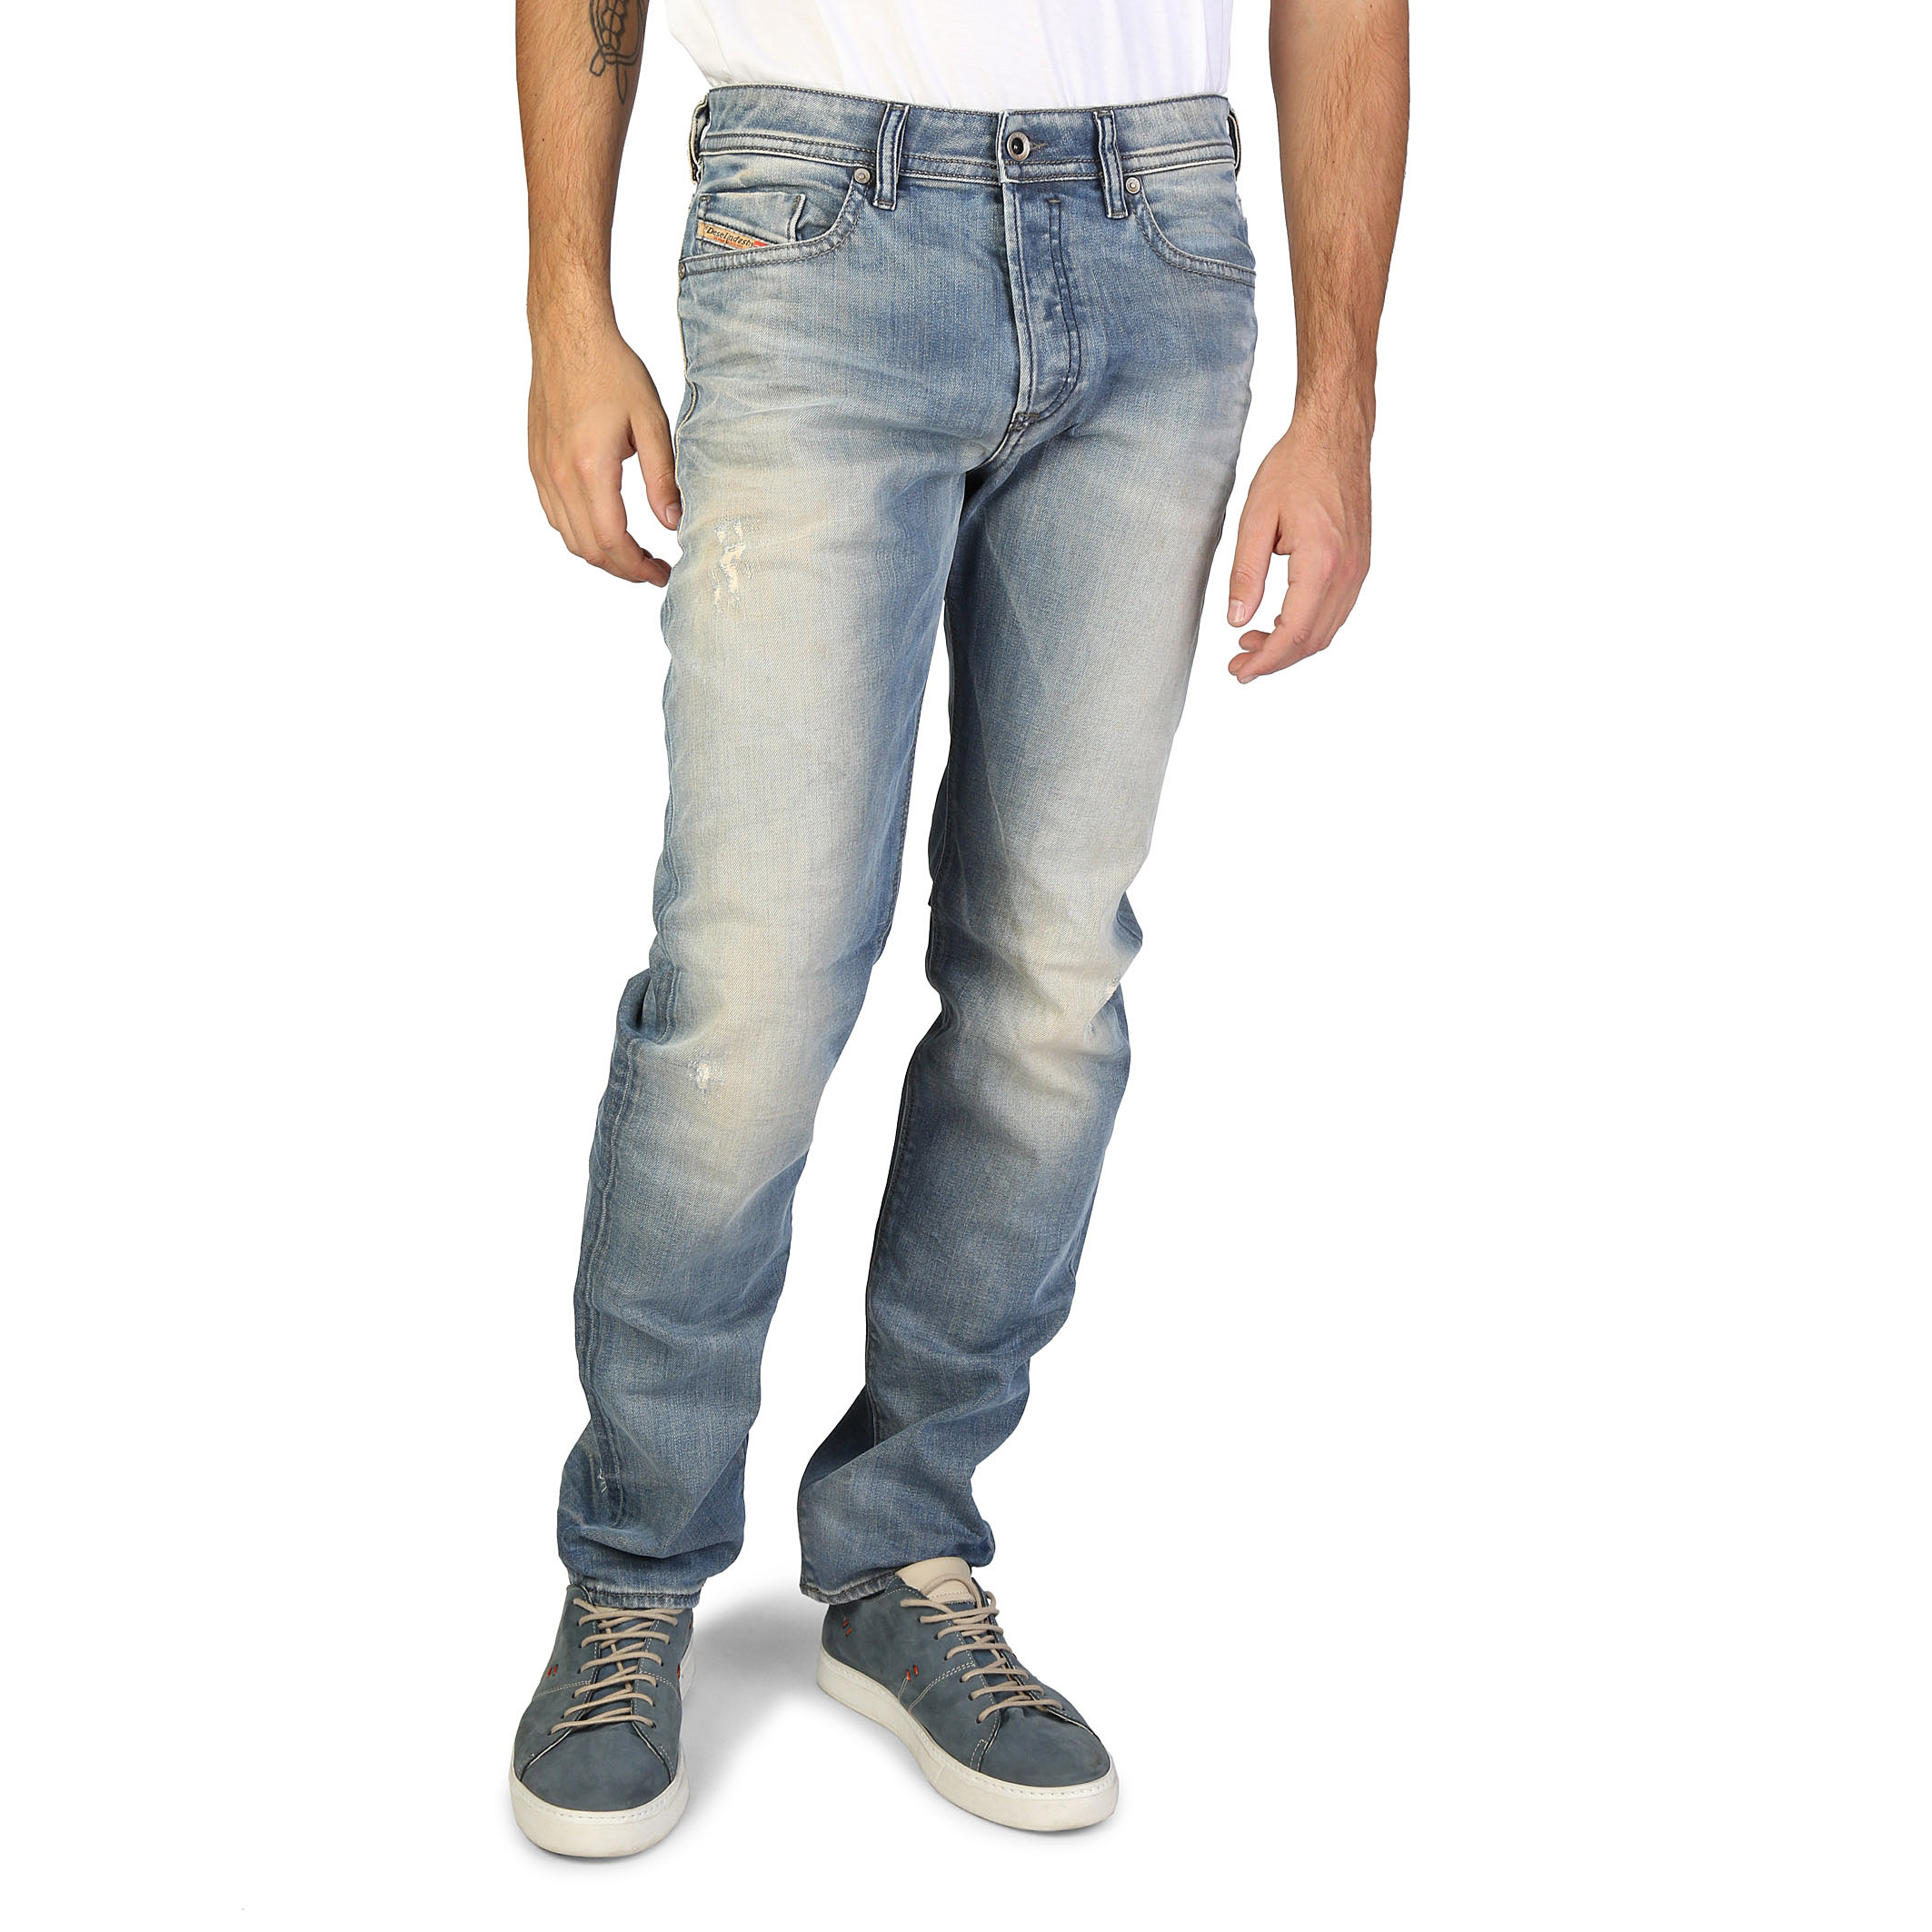 Jeans Diesel BUSTER_L32_00SDHB Uomo Blu 94889